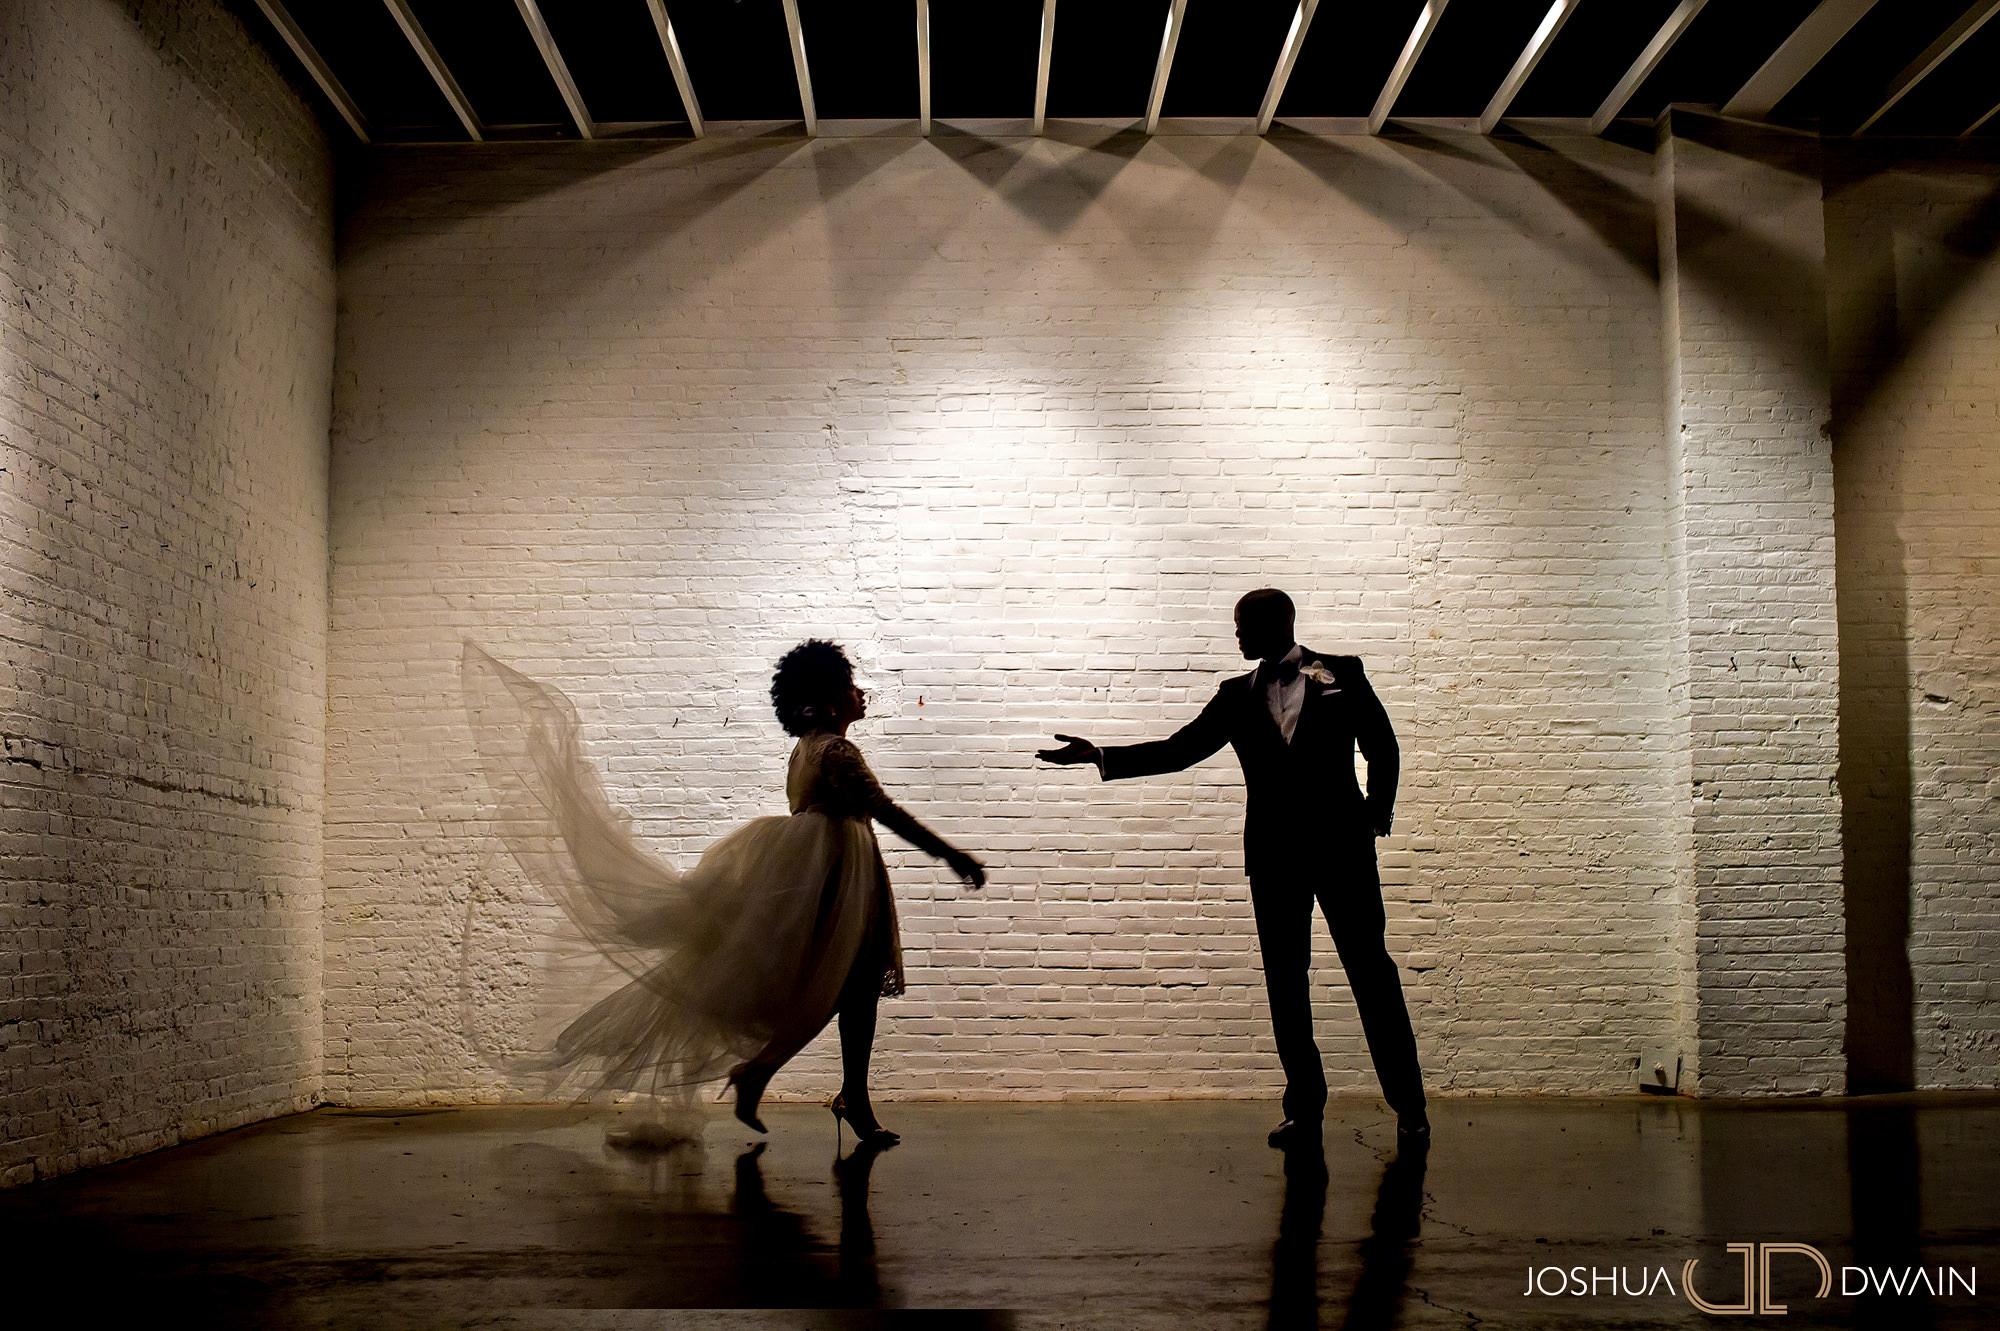 joshua-dwain-weddings-gallery-best-wedding-photographers-us-055